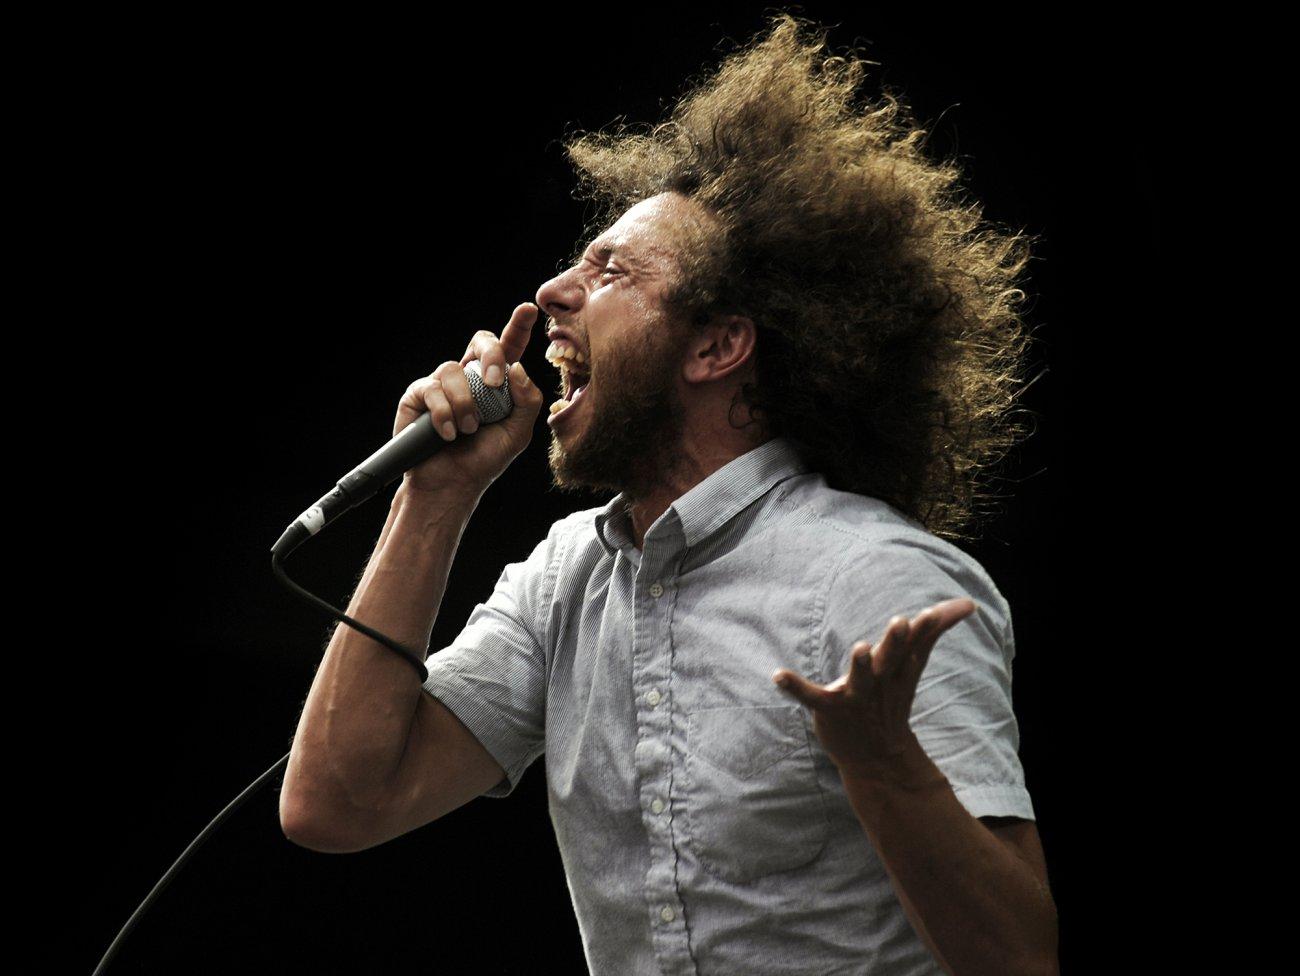 Zack de la Rocha, do Rage Against The Machine, lança